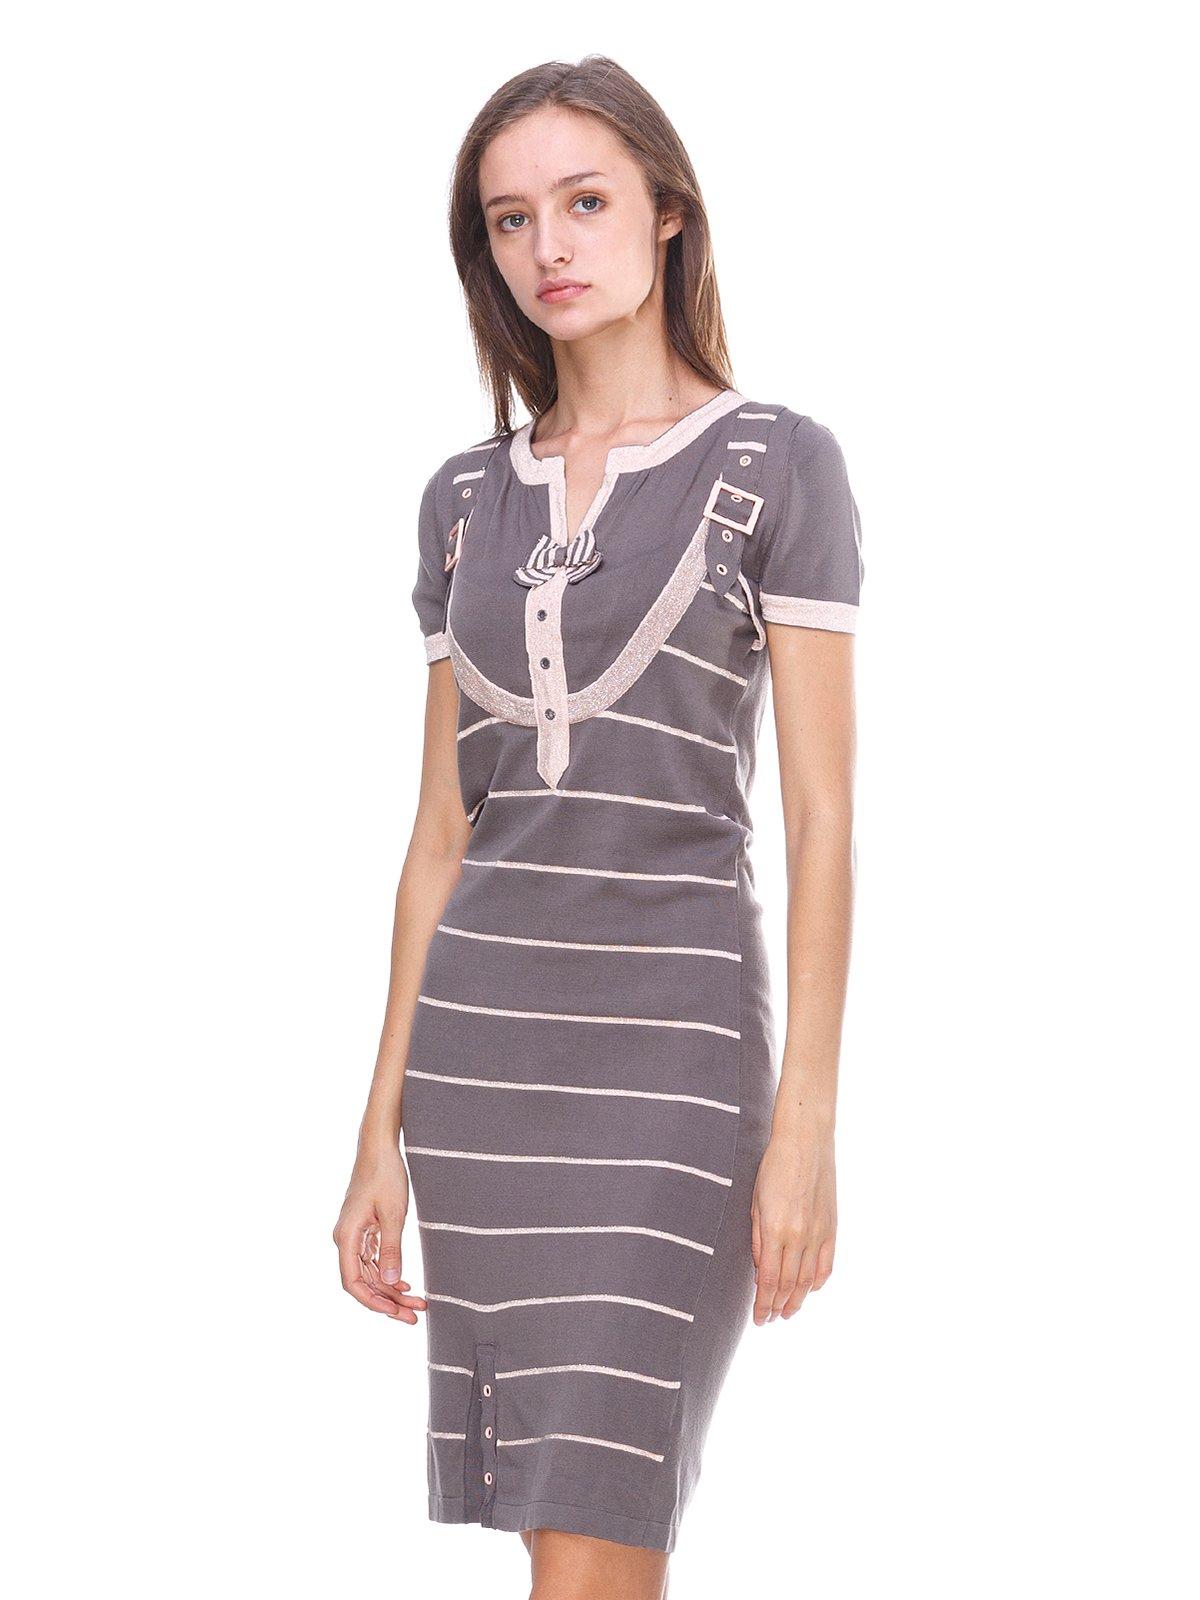 Сукня сіра в смужку   2619391